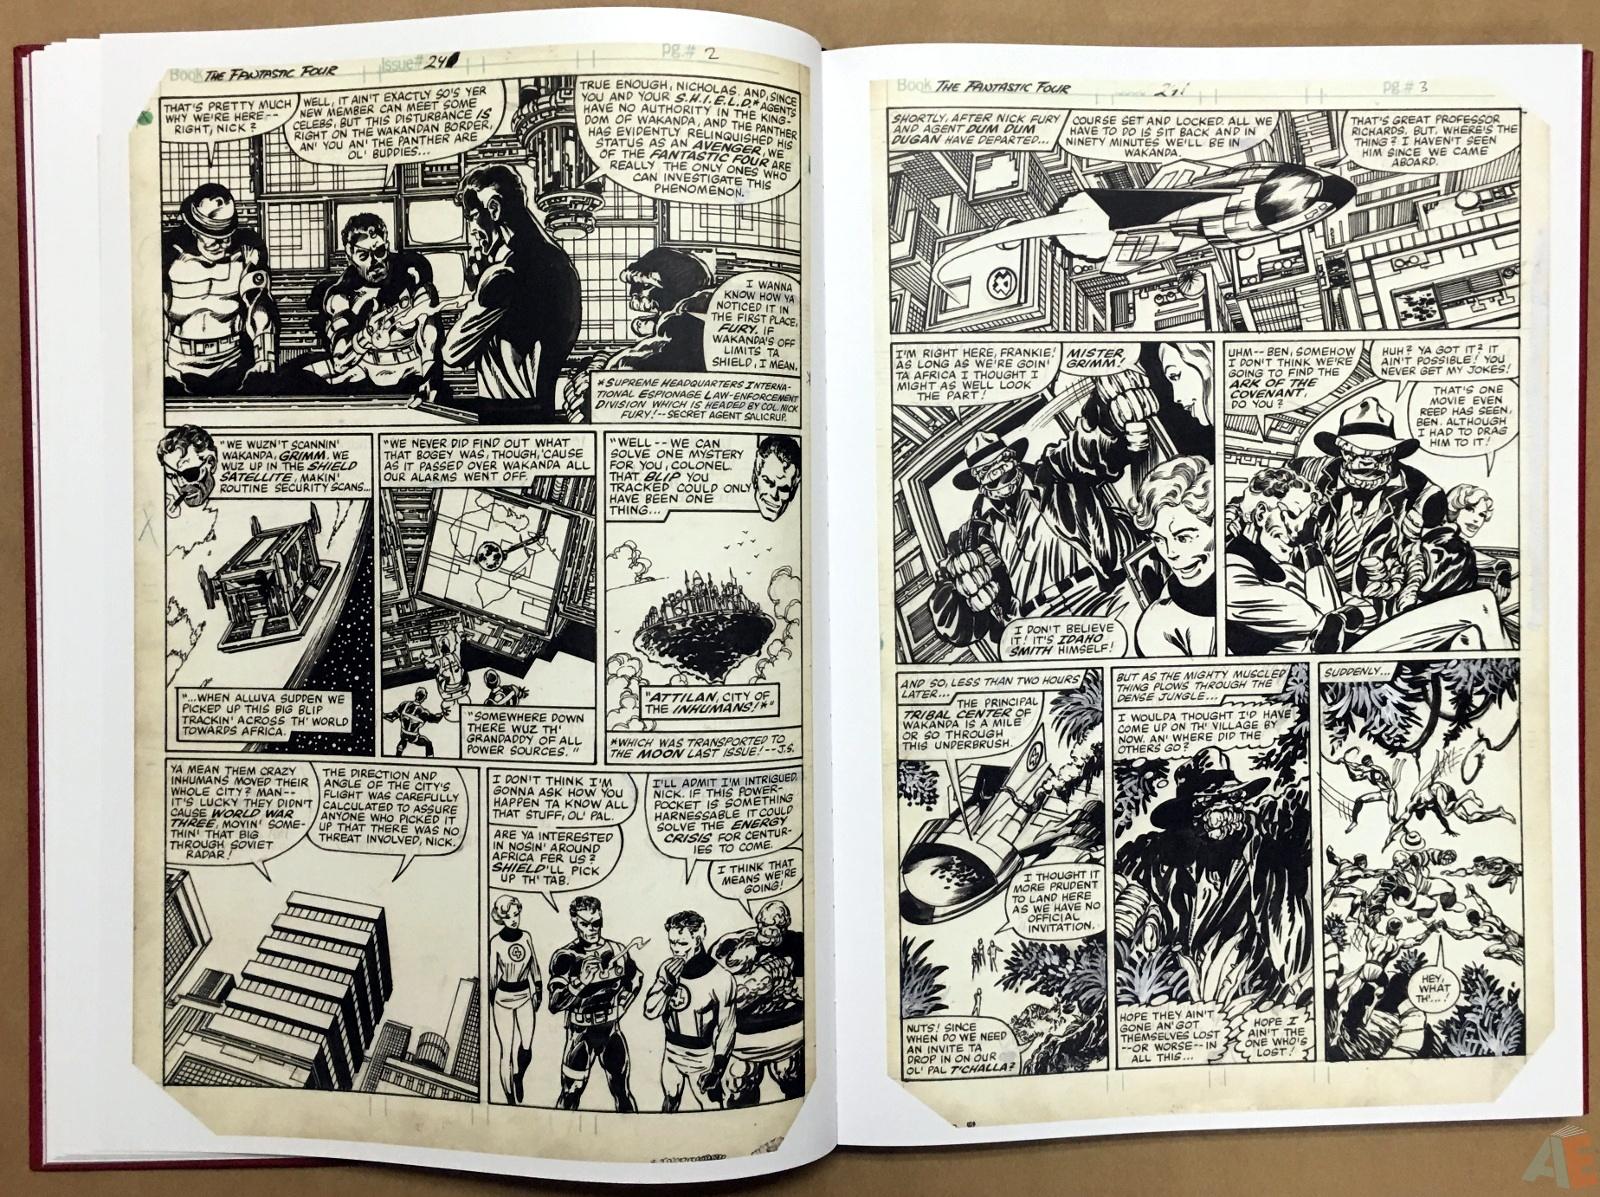 John Byrne's The Fantastic Four Artist's Edition 18